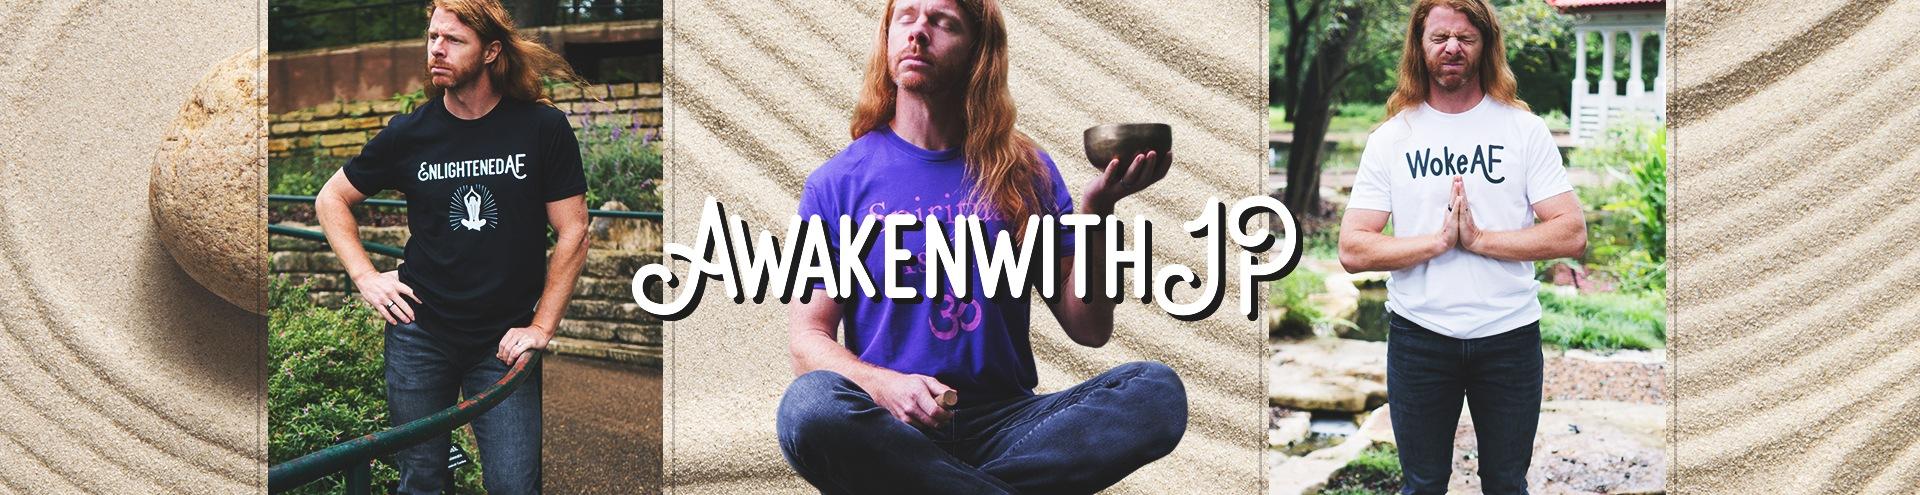 AwakenWithJP Store